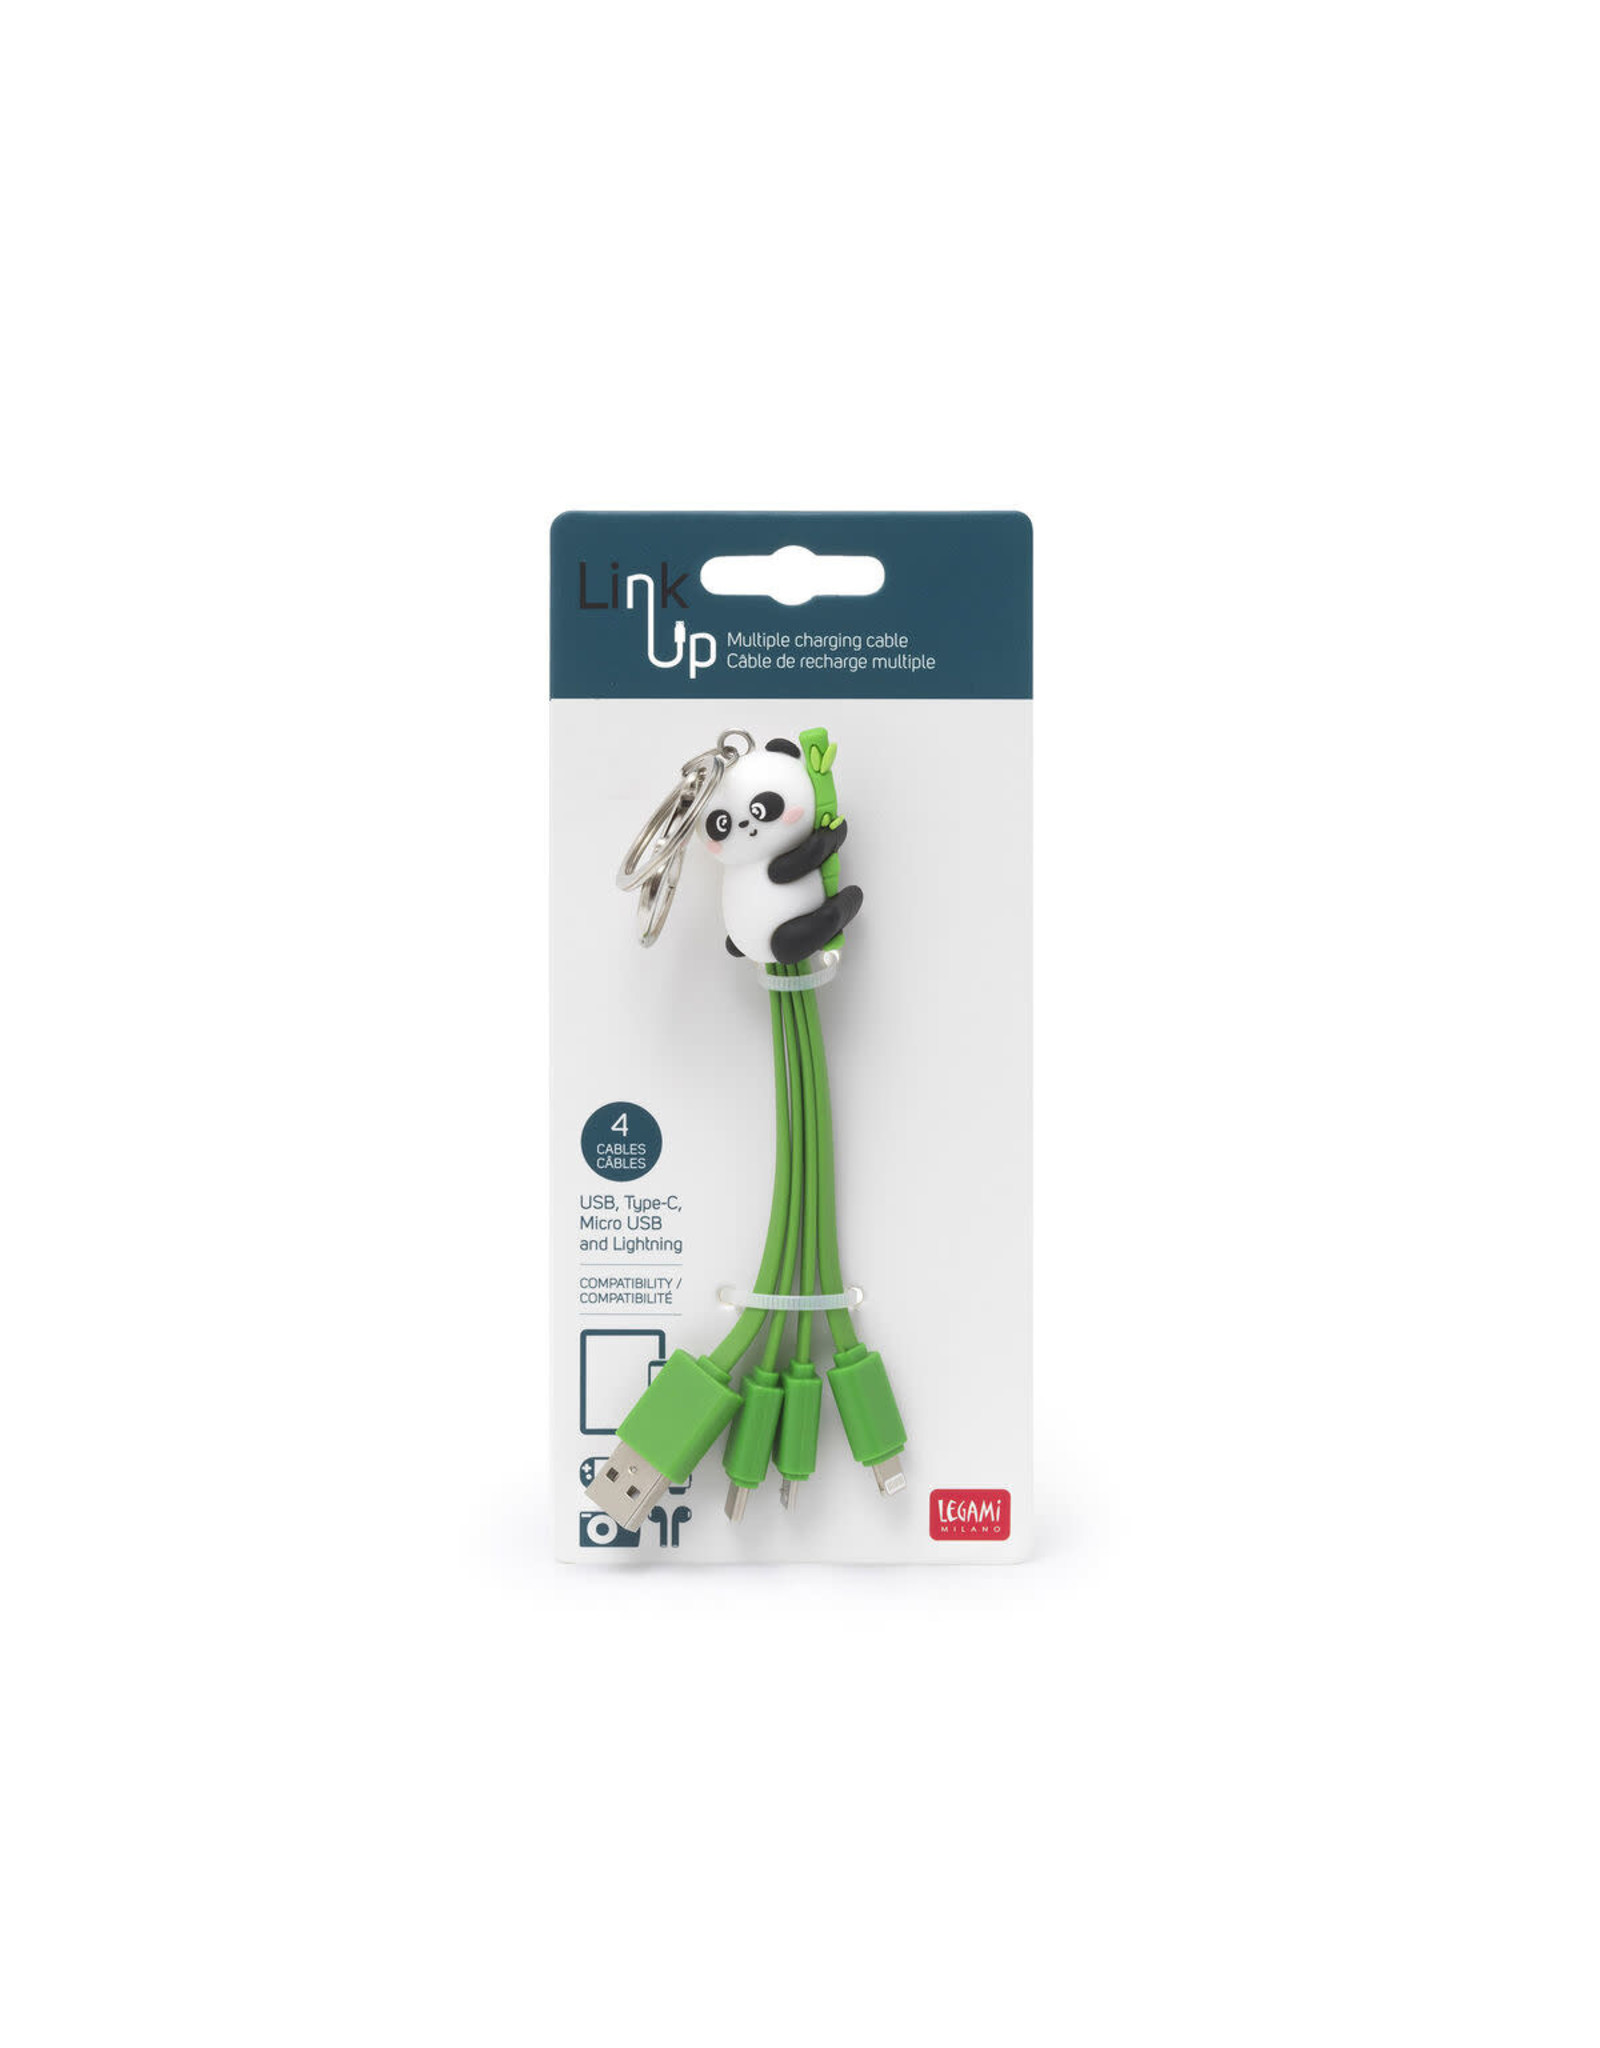 Legami charging cables - panda